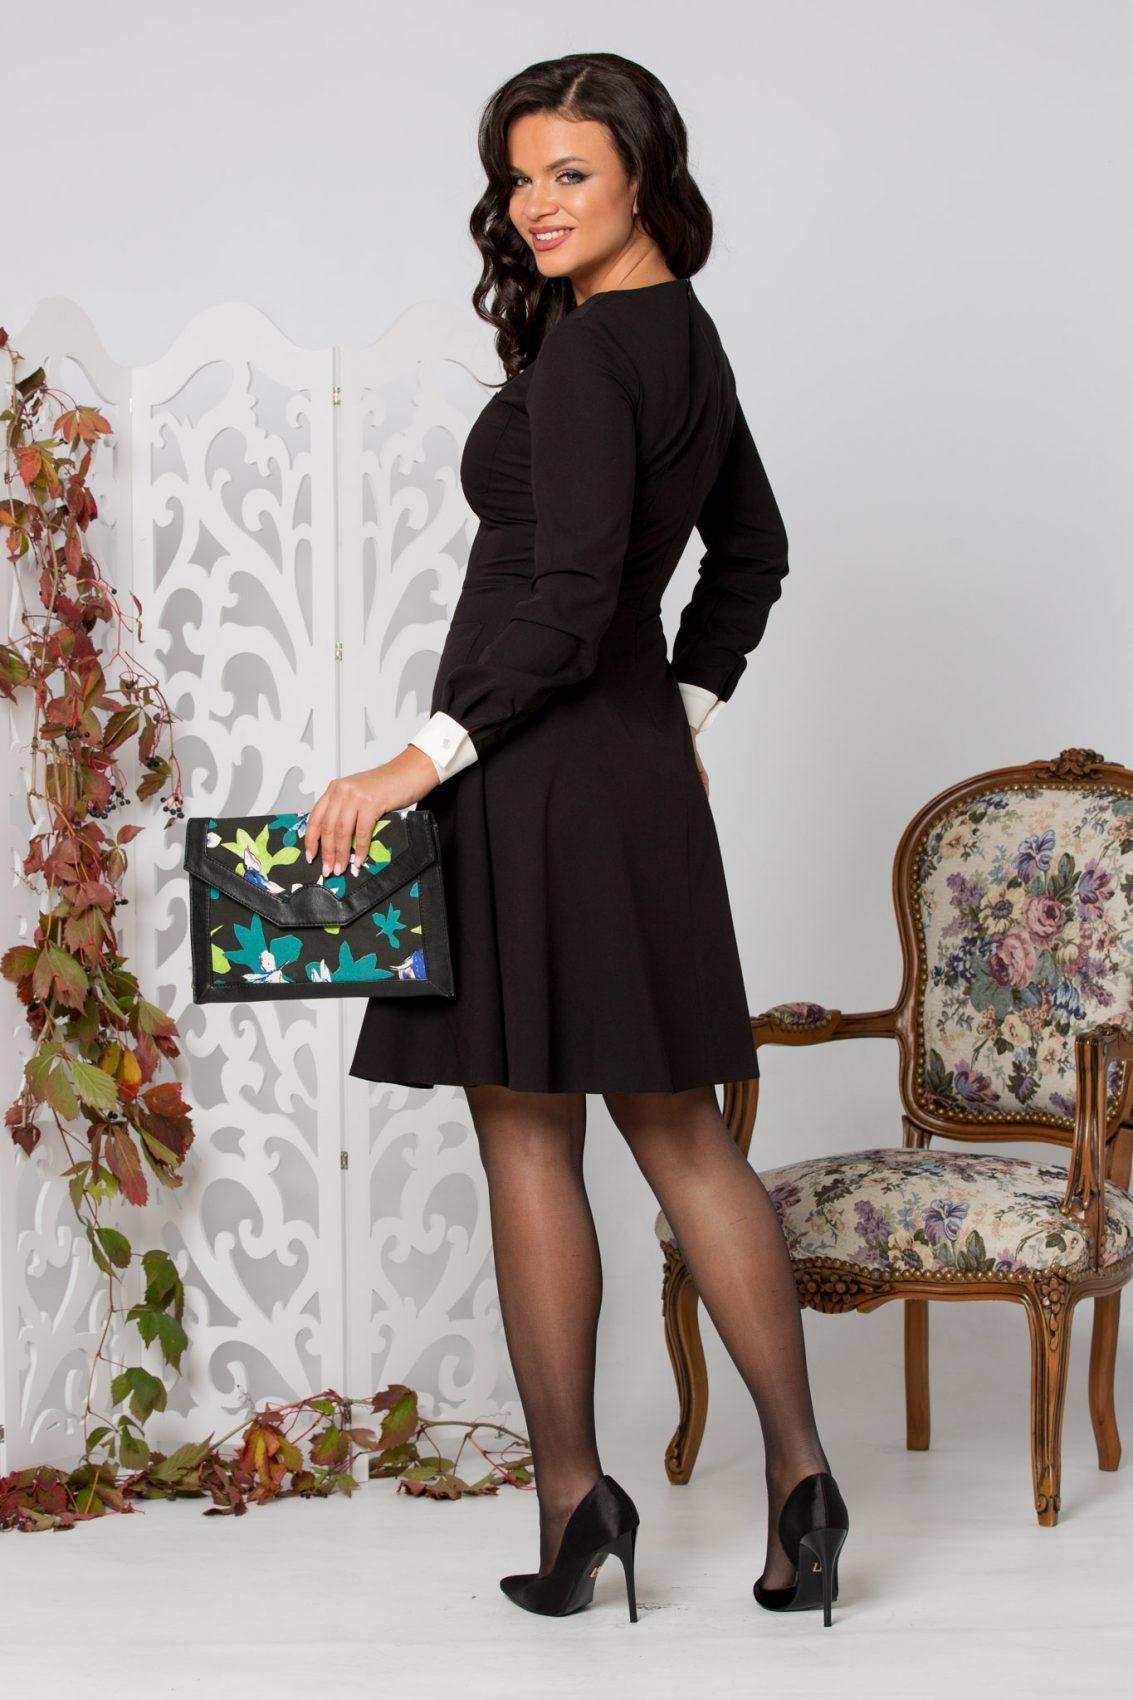 La Donna Galla Μαύρο Φόρεμα 5278